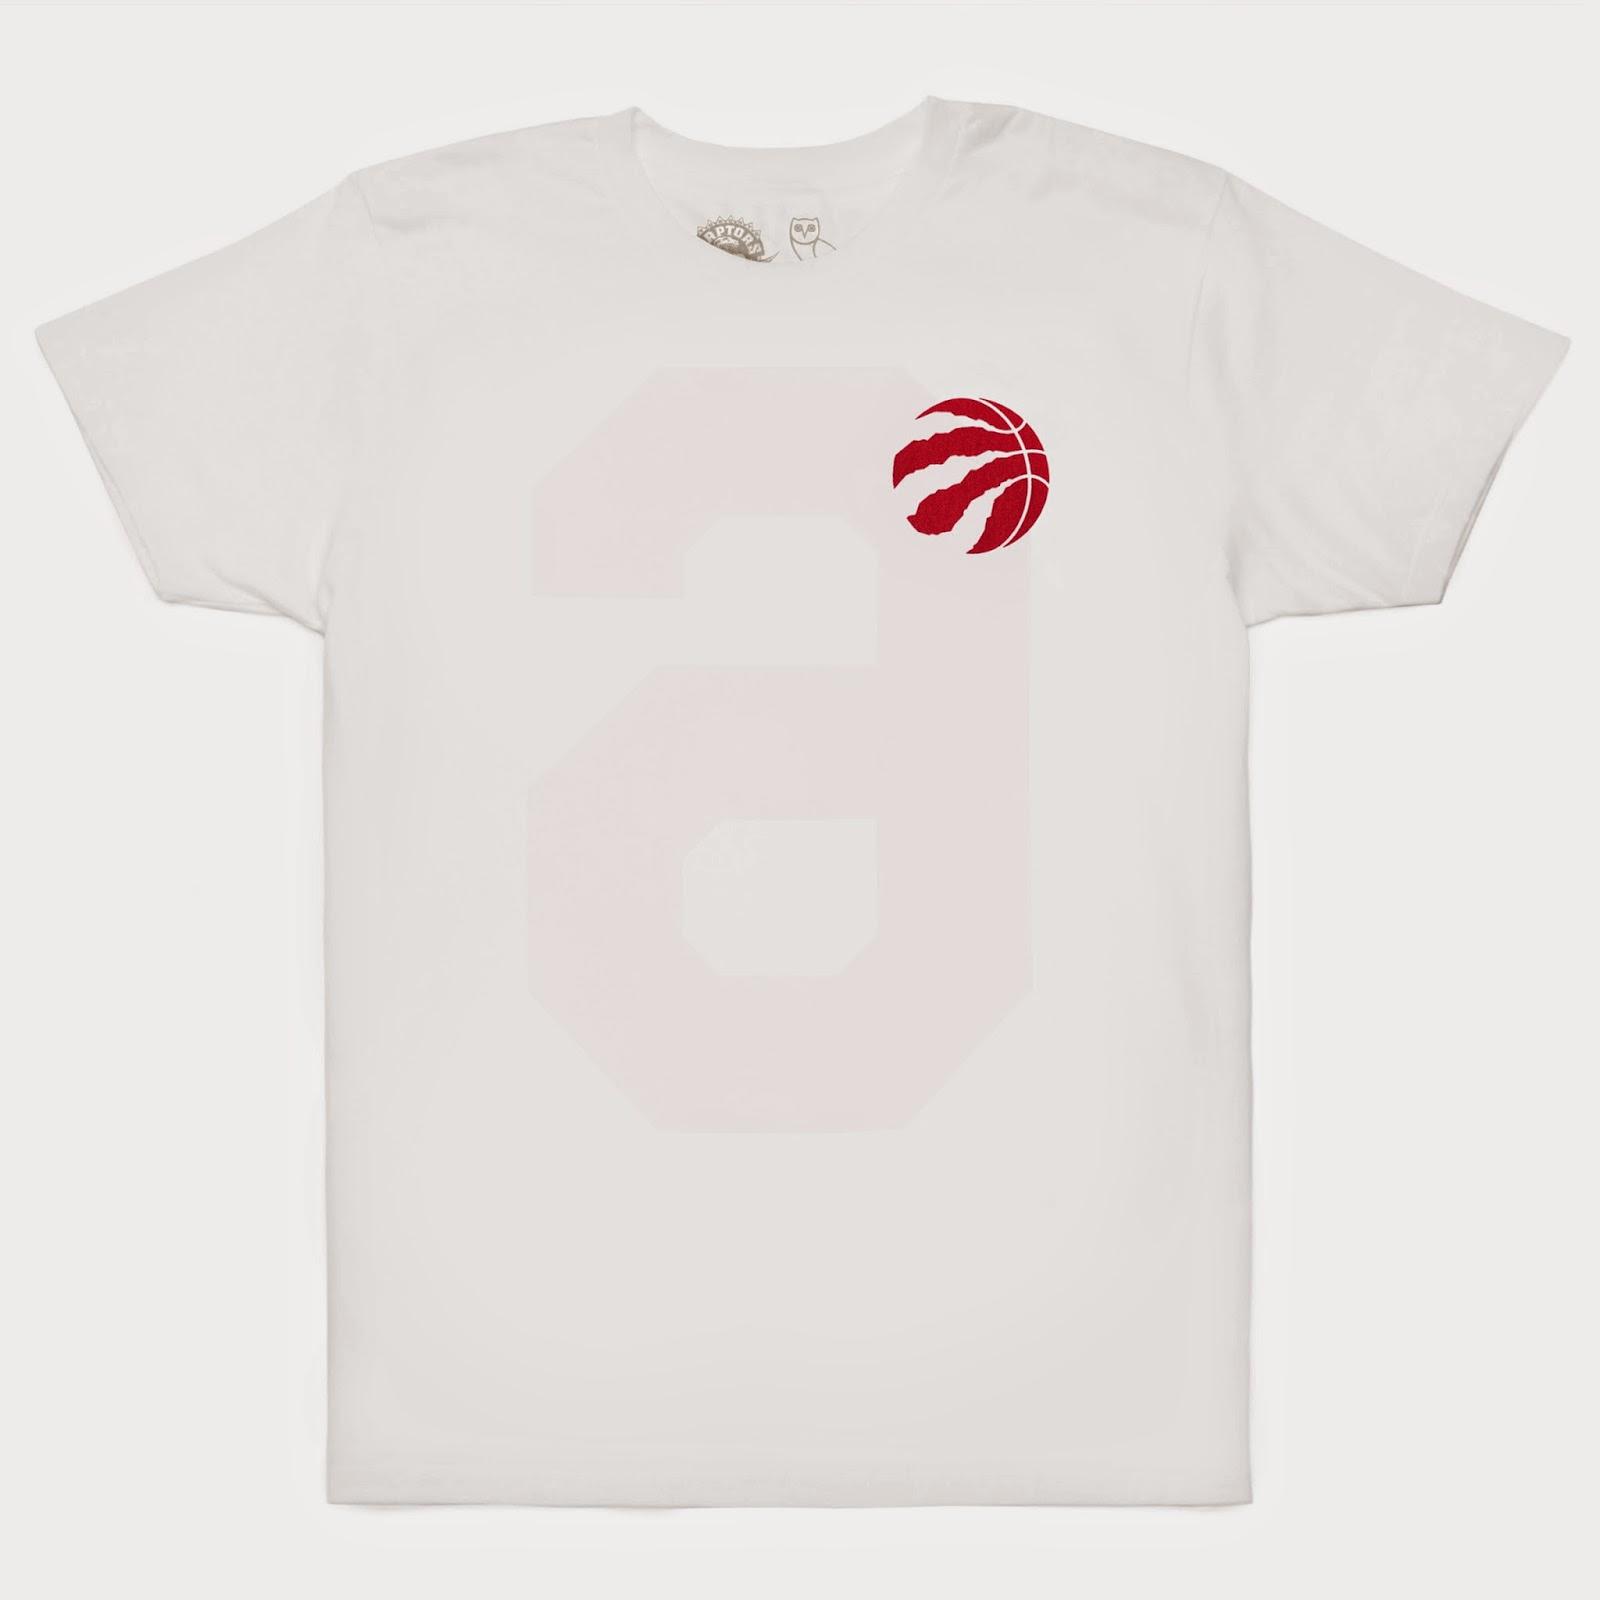 a969a9454 Toronto Raptors Introduce OVO 2015 NBA Playoff Edition TEE